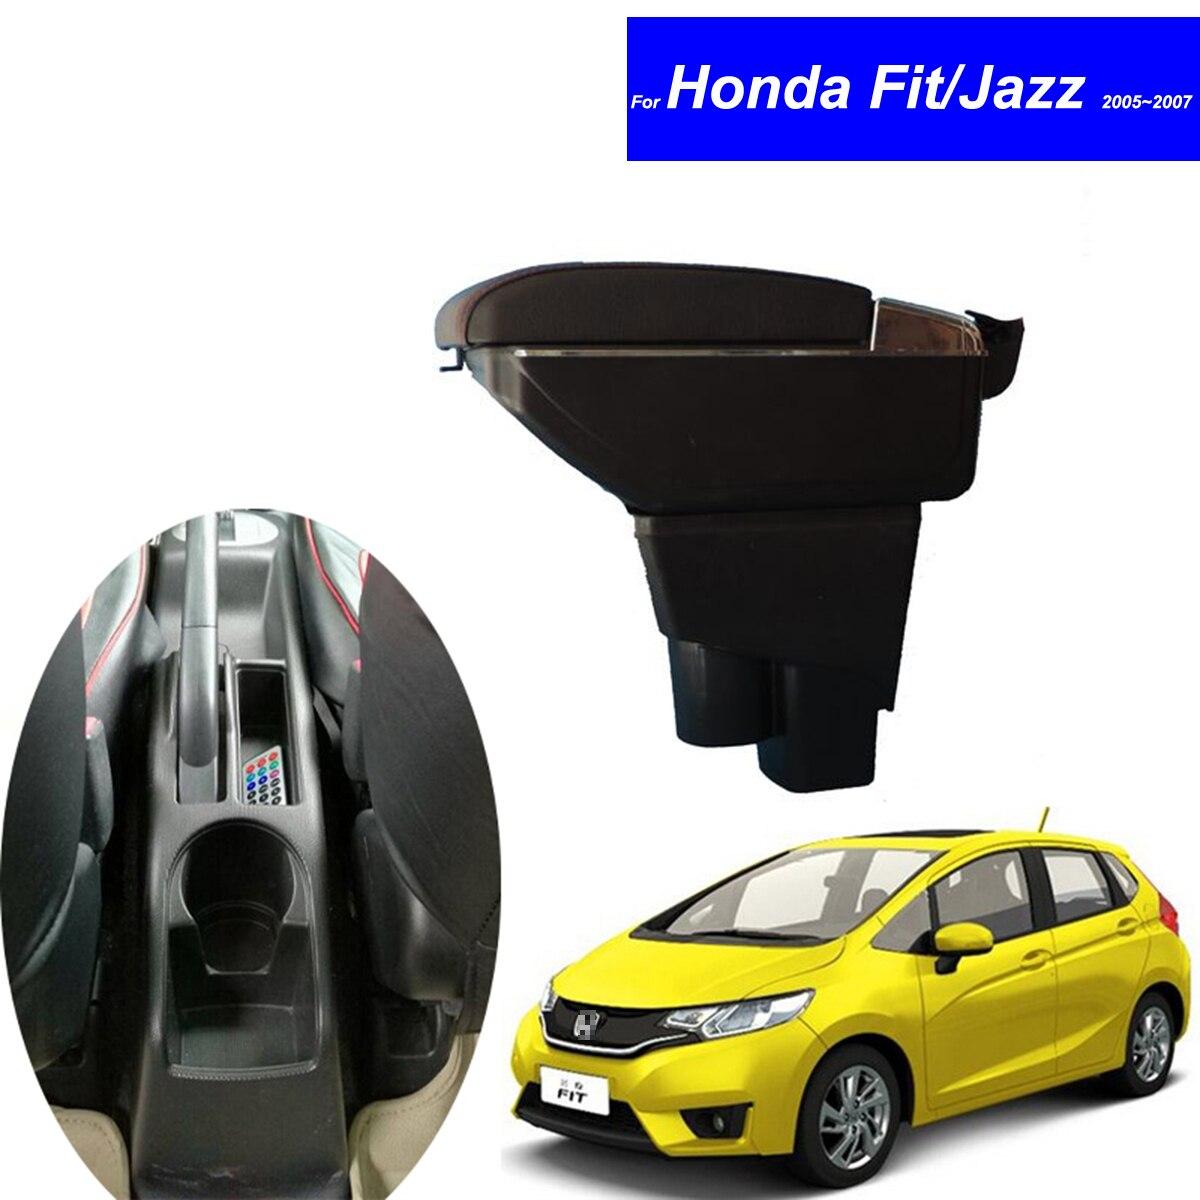 2013 honda fit reviews honda fit price photos and html autos post